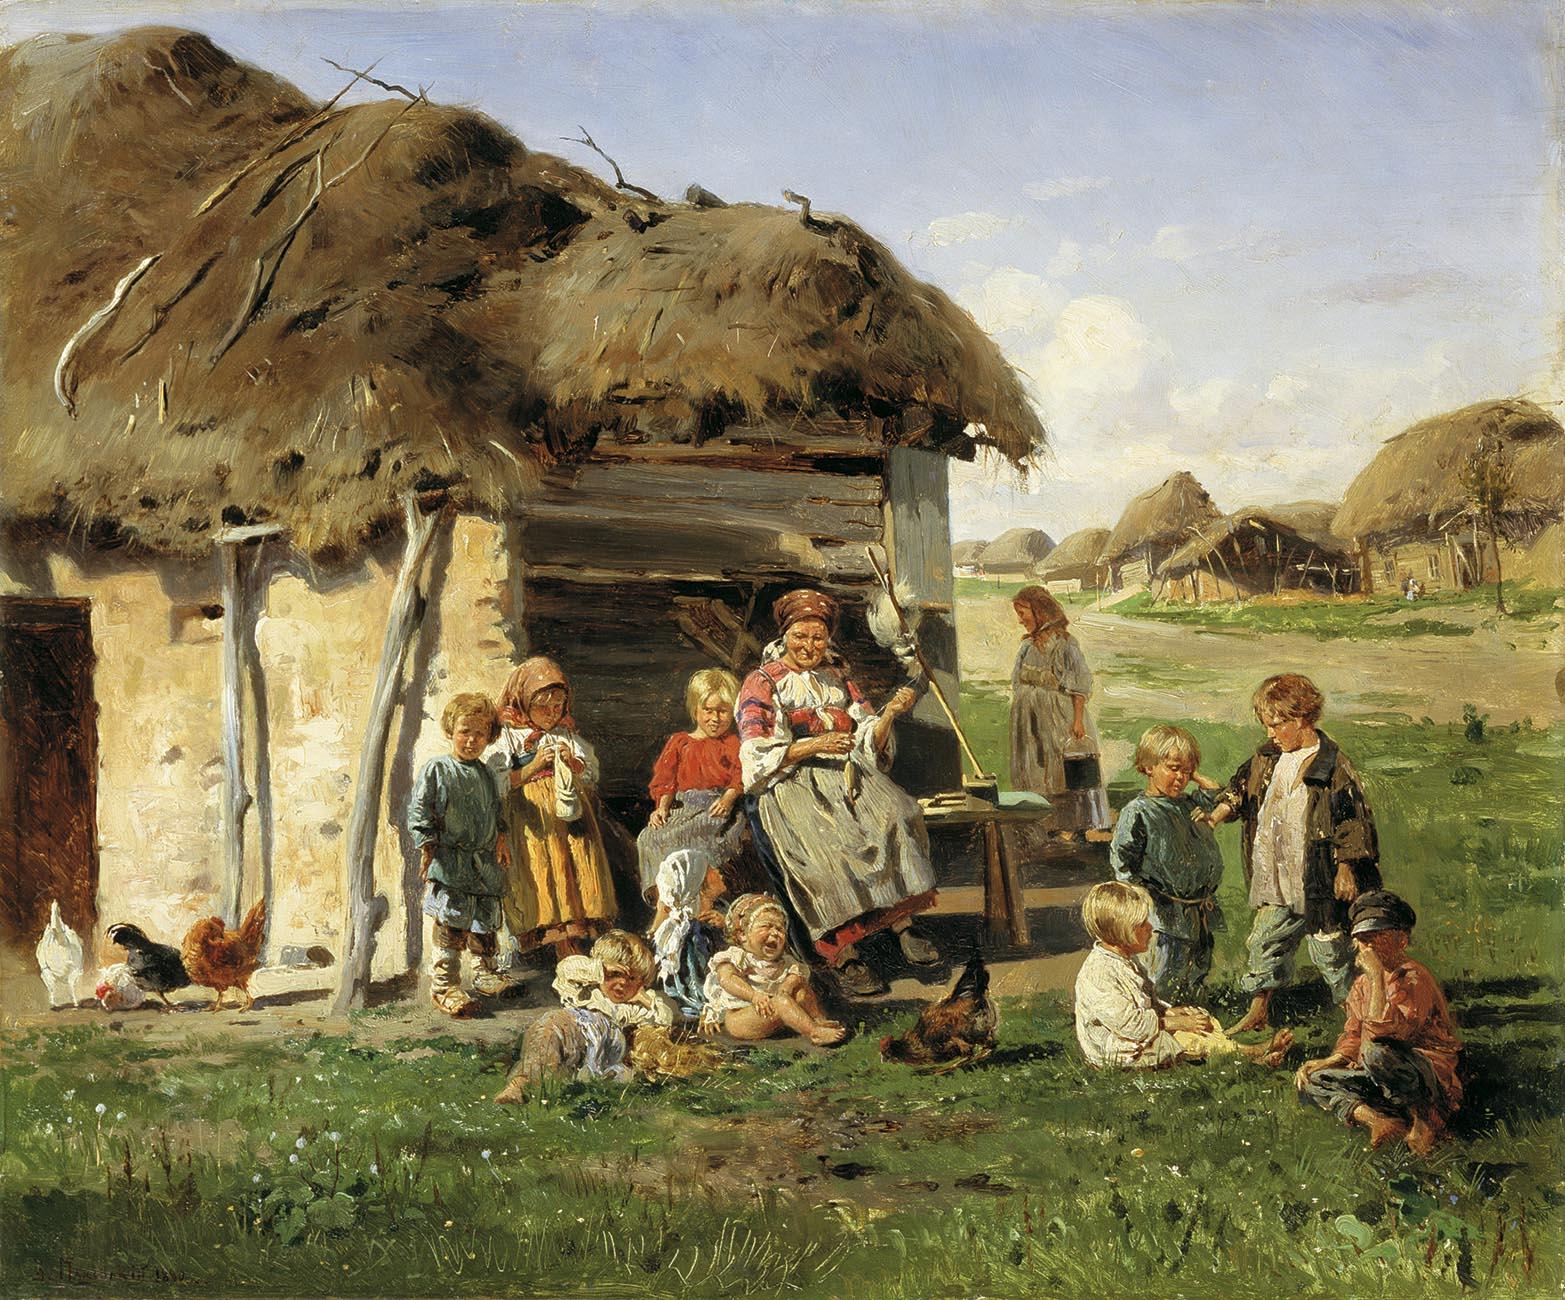 �������� ���������. ������������ ����. 1890.